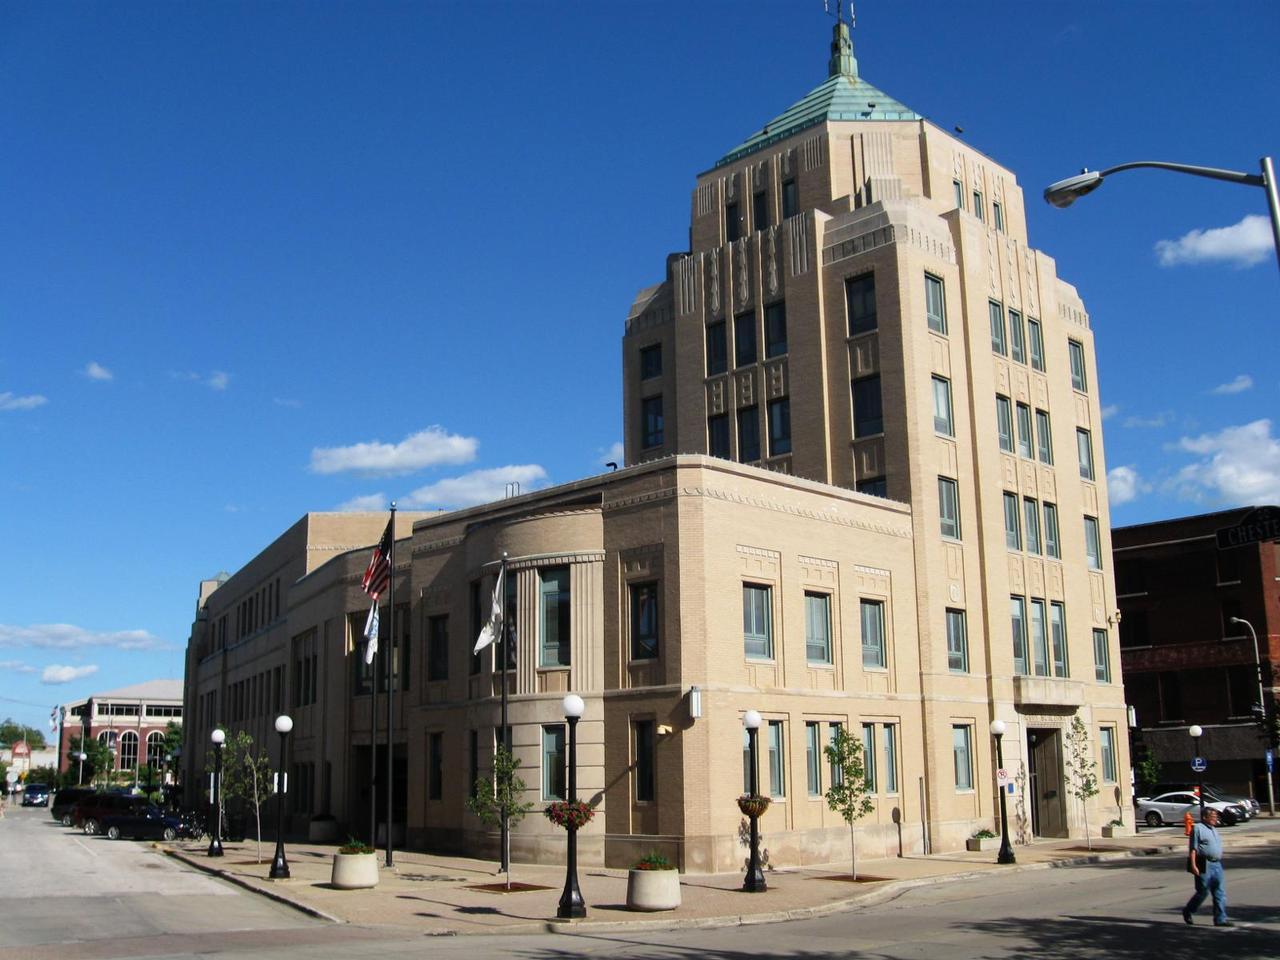 City Building Champaign Illinois Submission 1280x960